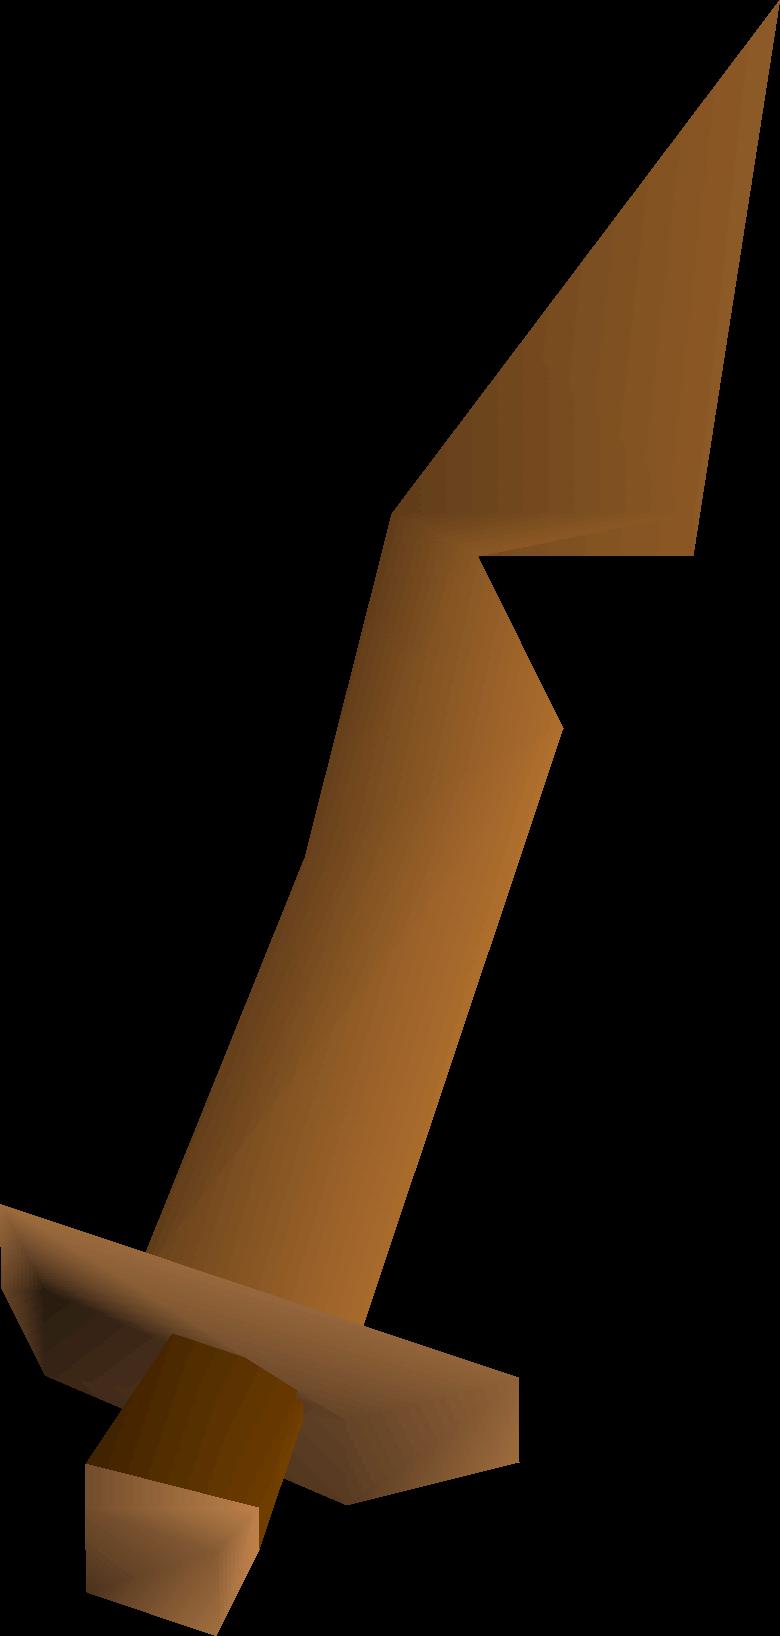 Rusty sword detail